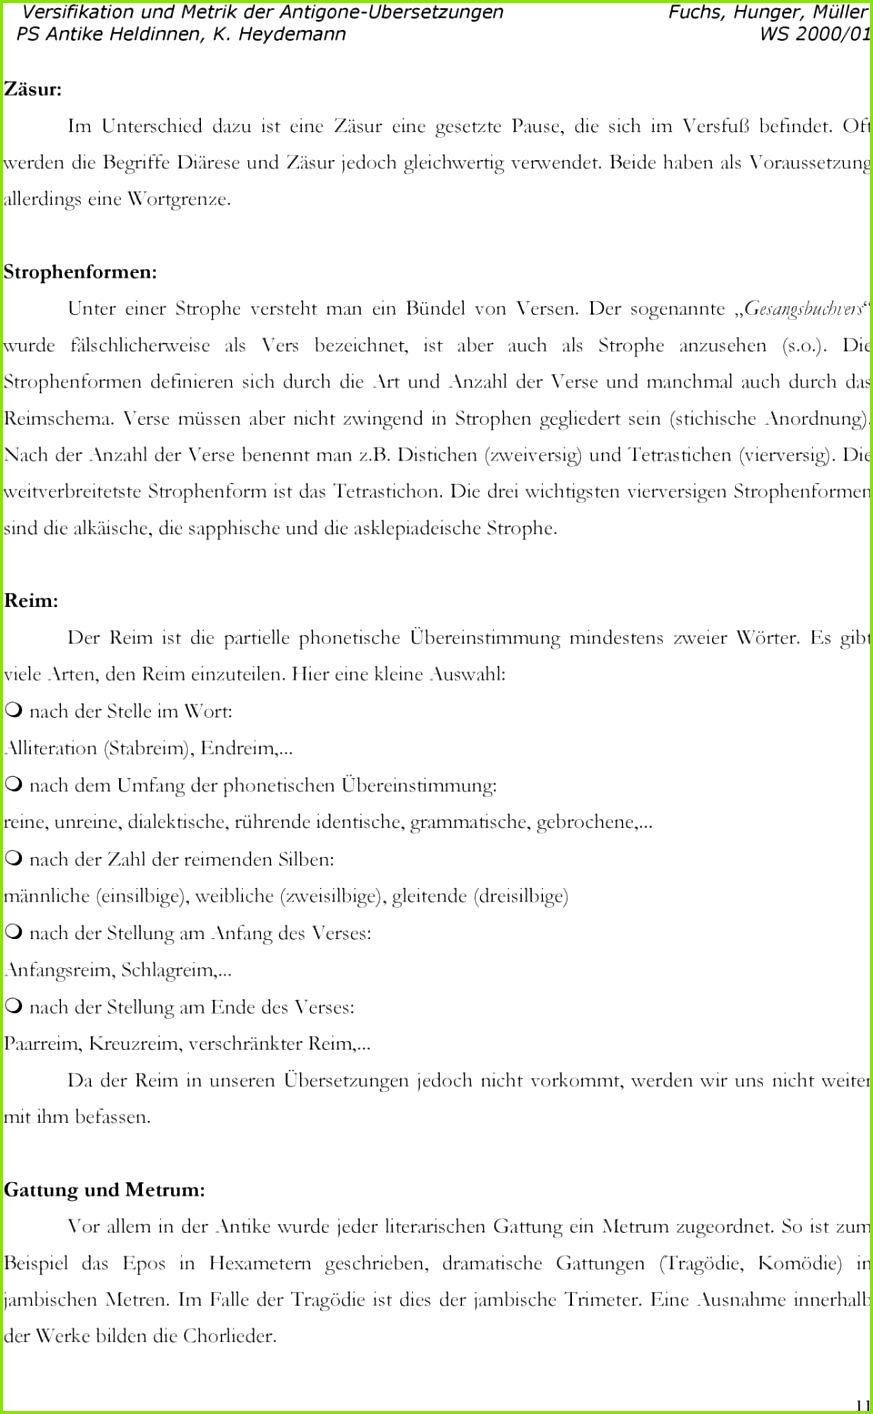 versifikation page 11